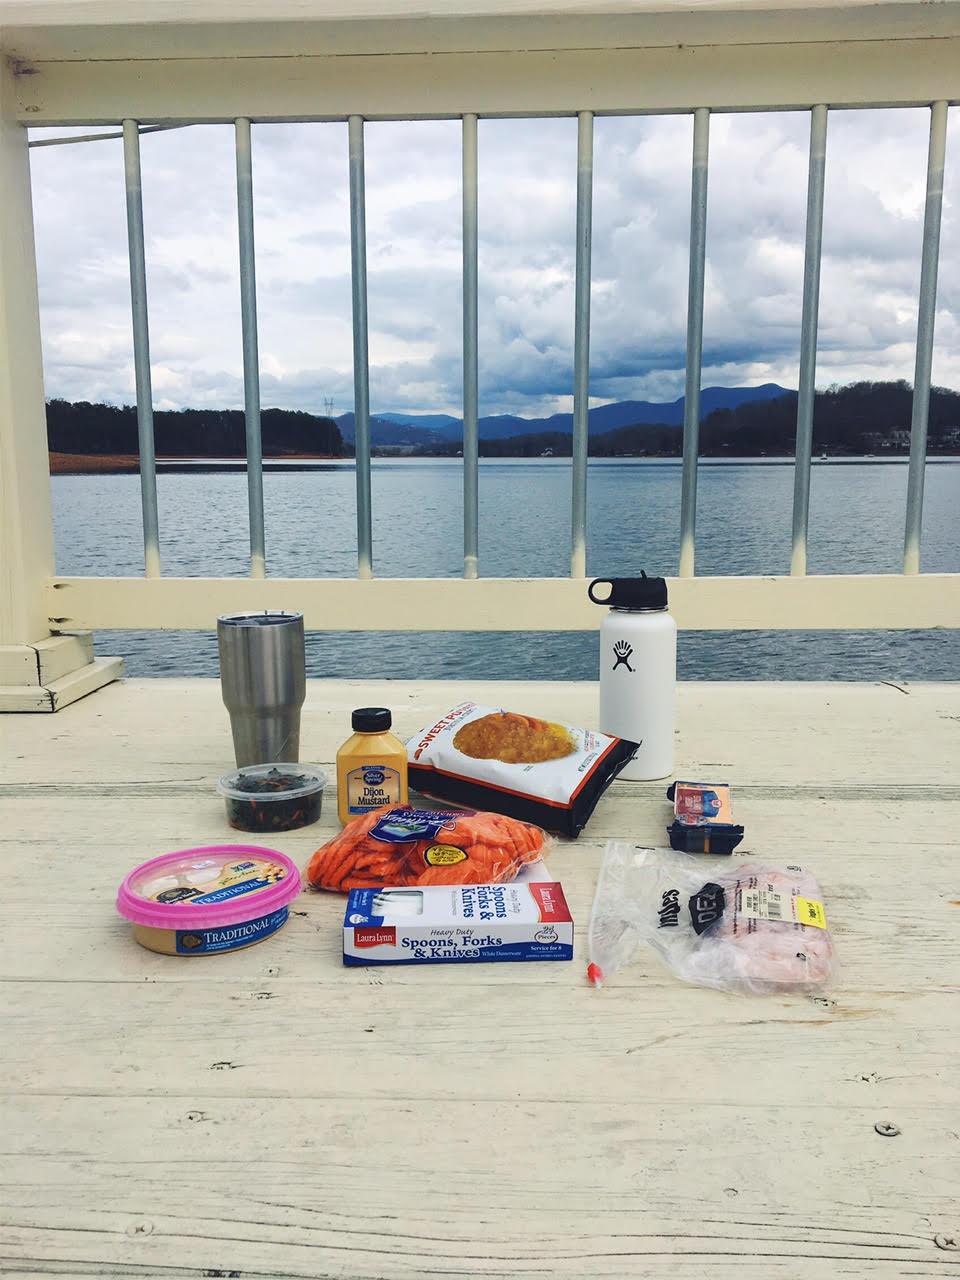 Our impromptu picnic :)